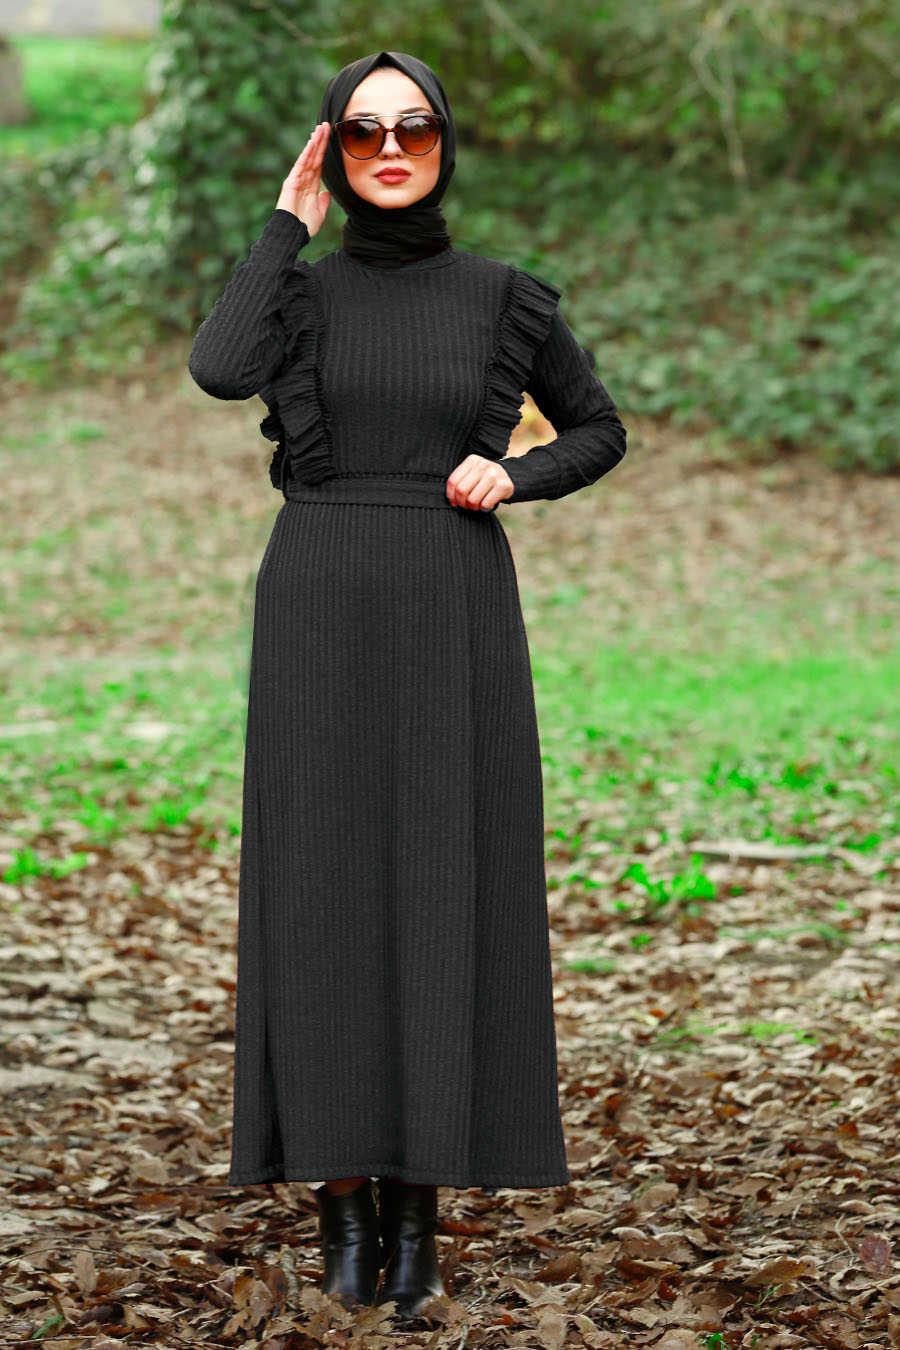 Neva Style - Black Hijab Dress 4032S